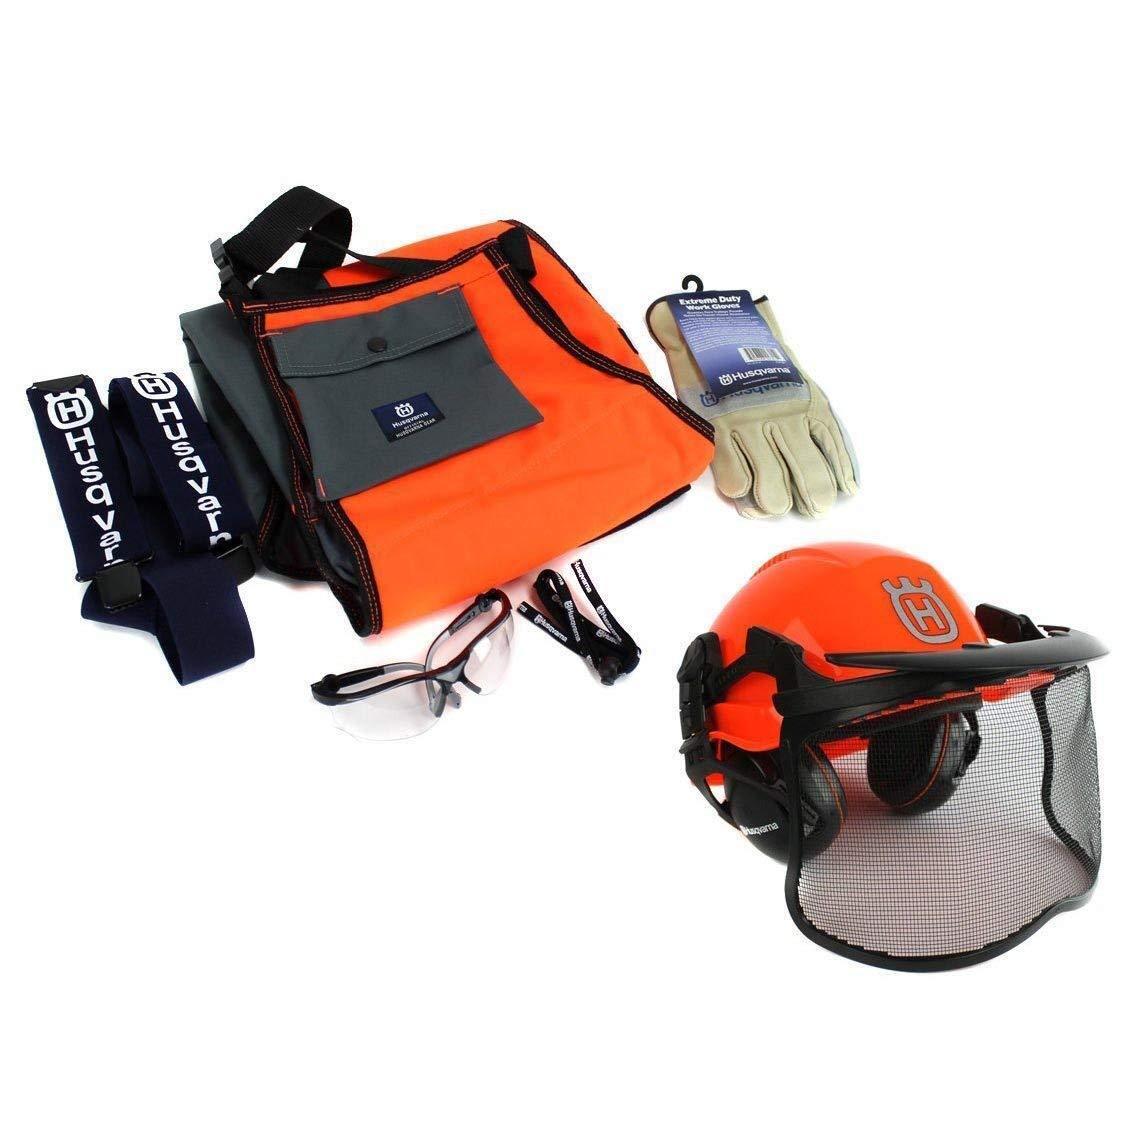 Husqvarna 531307181 Chain Saw Protective Apparel Powerkit, Homeowner